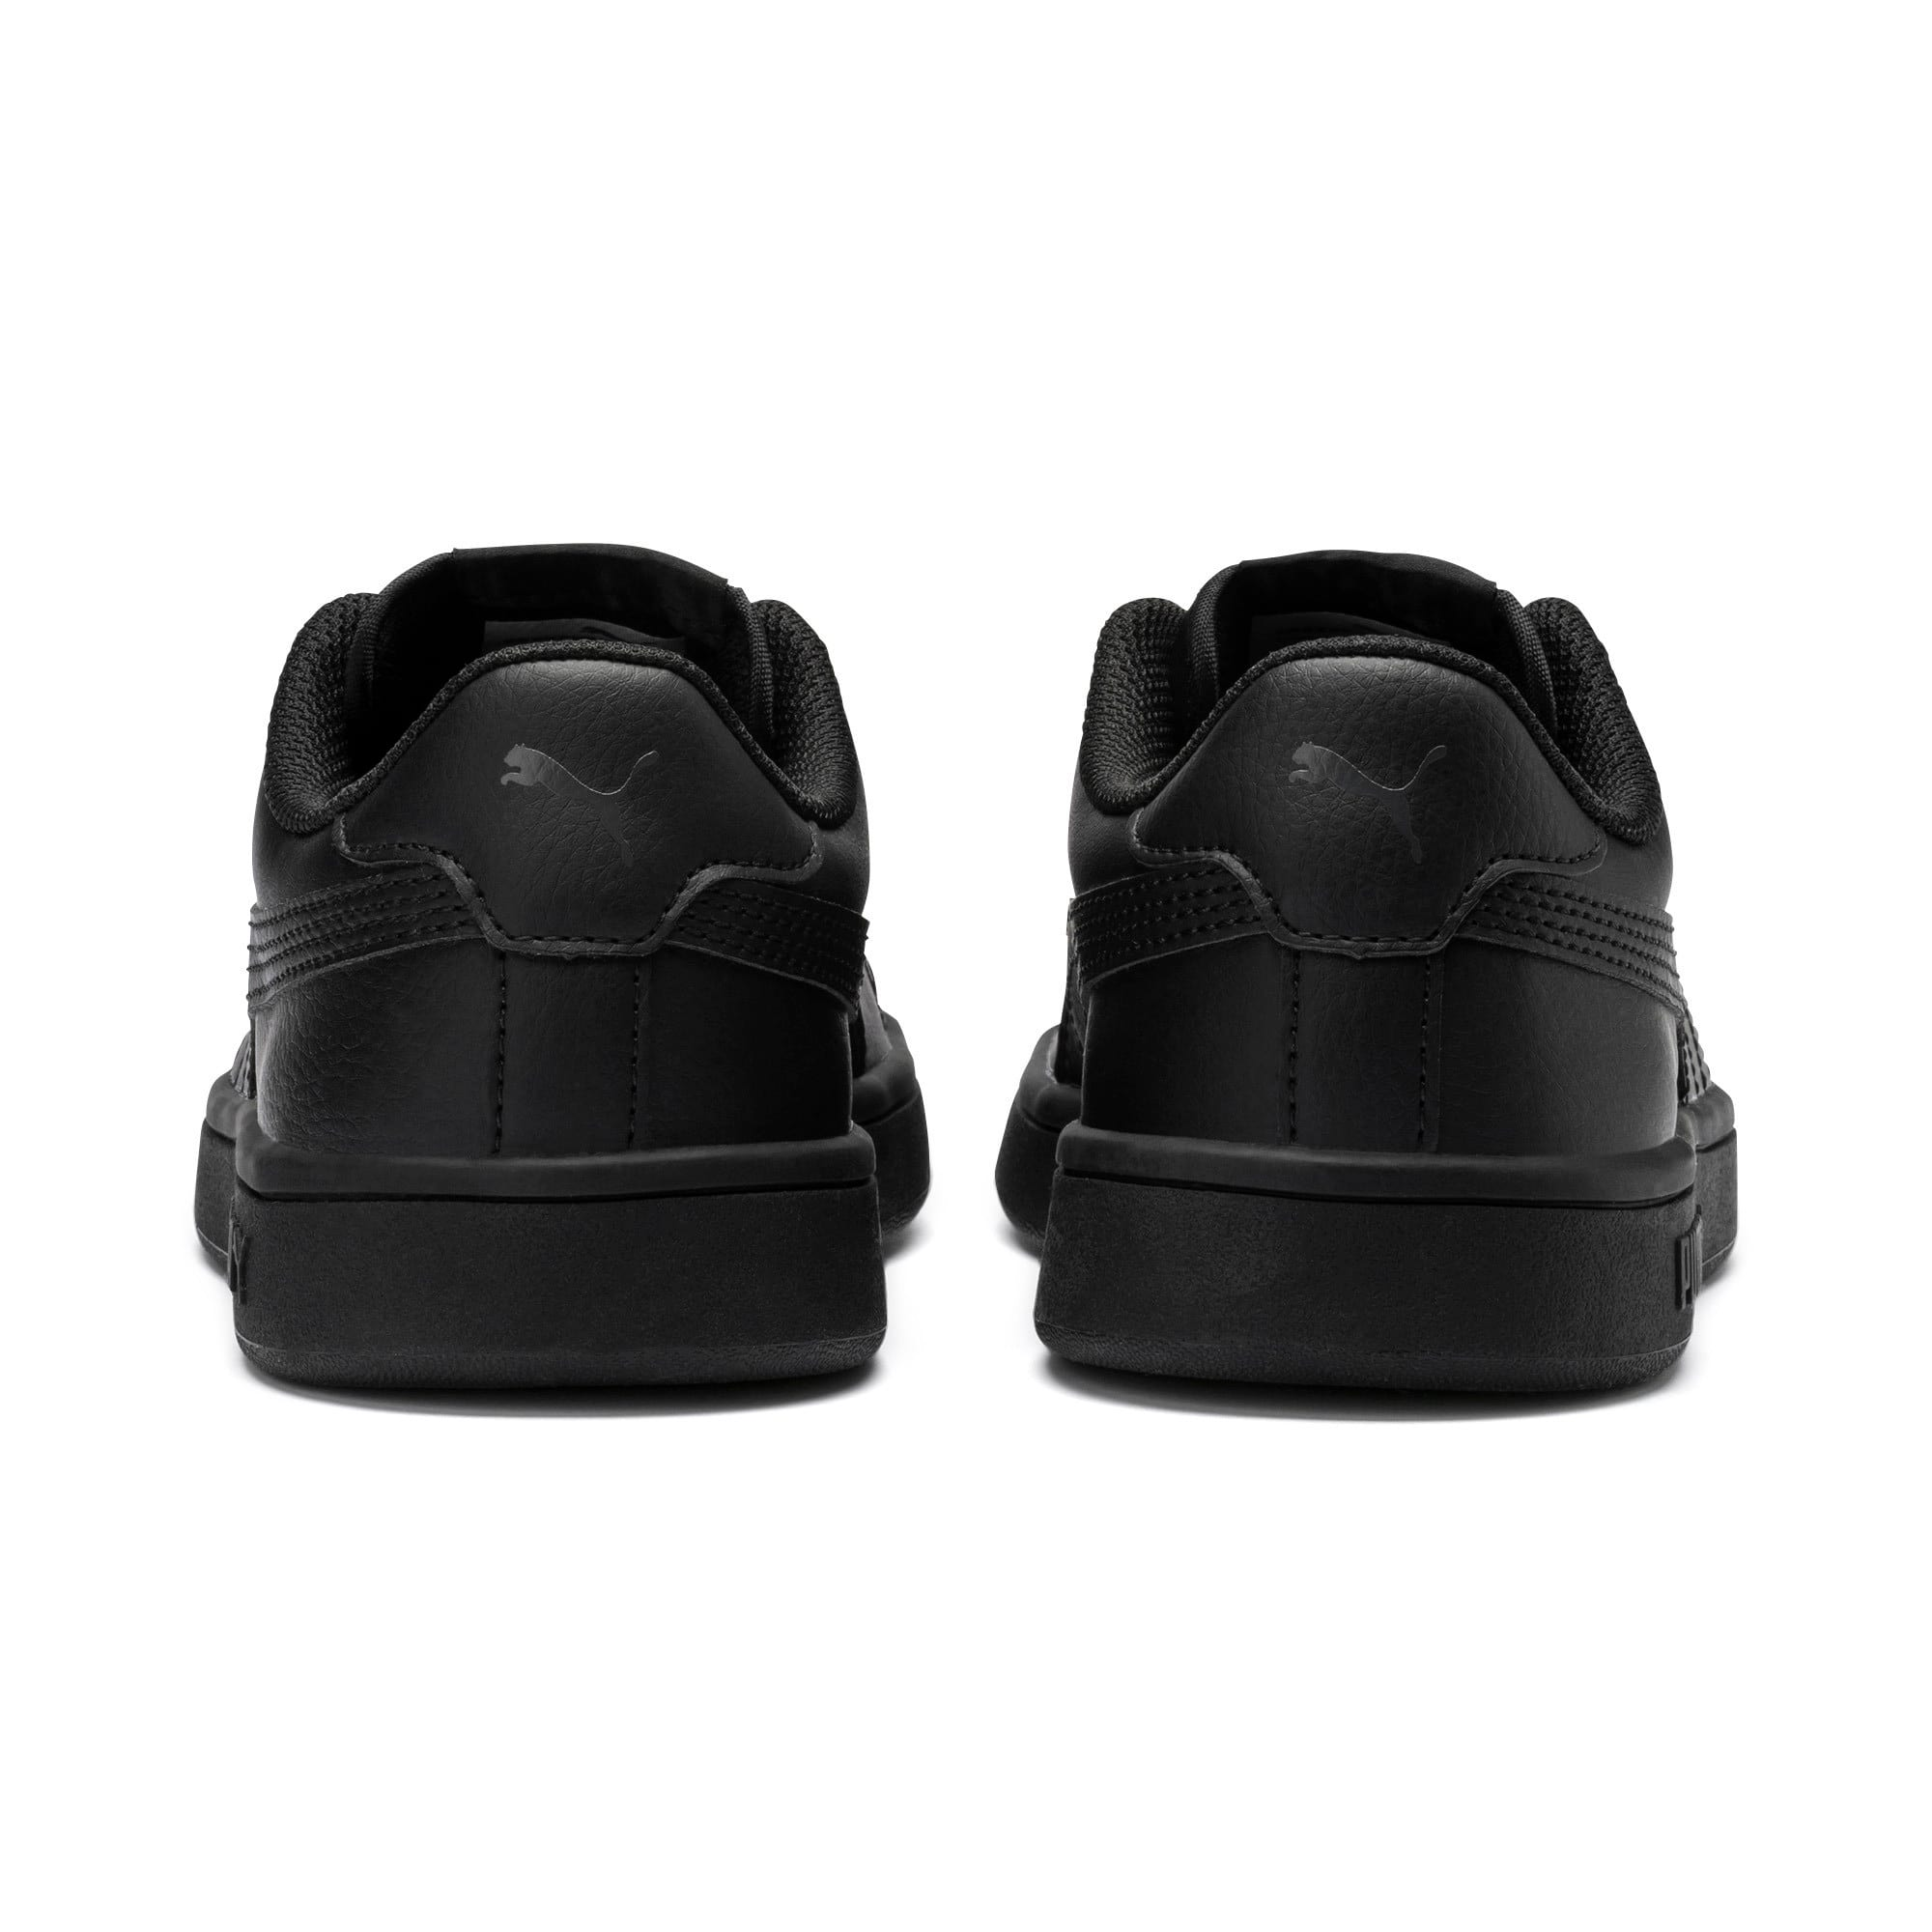 Thumbnail 3 of PUMA Smash v2 Leather Sneakers JR, Puma Black-Puma Black, medium